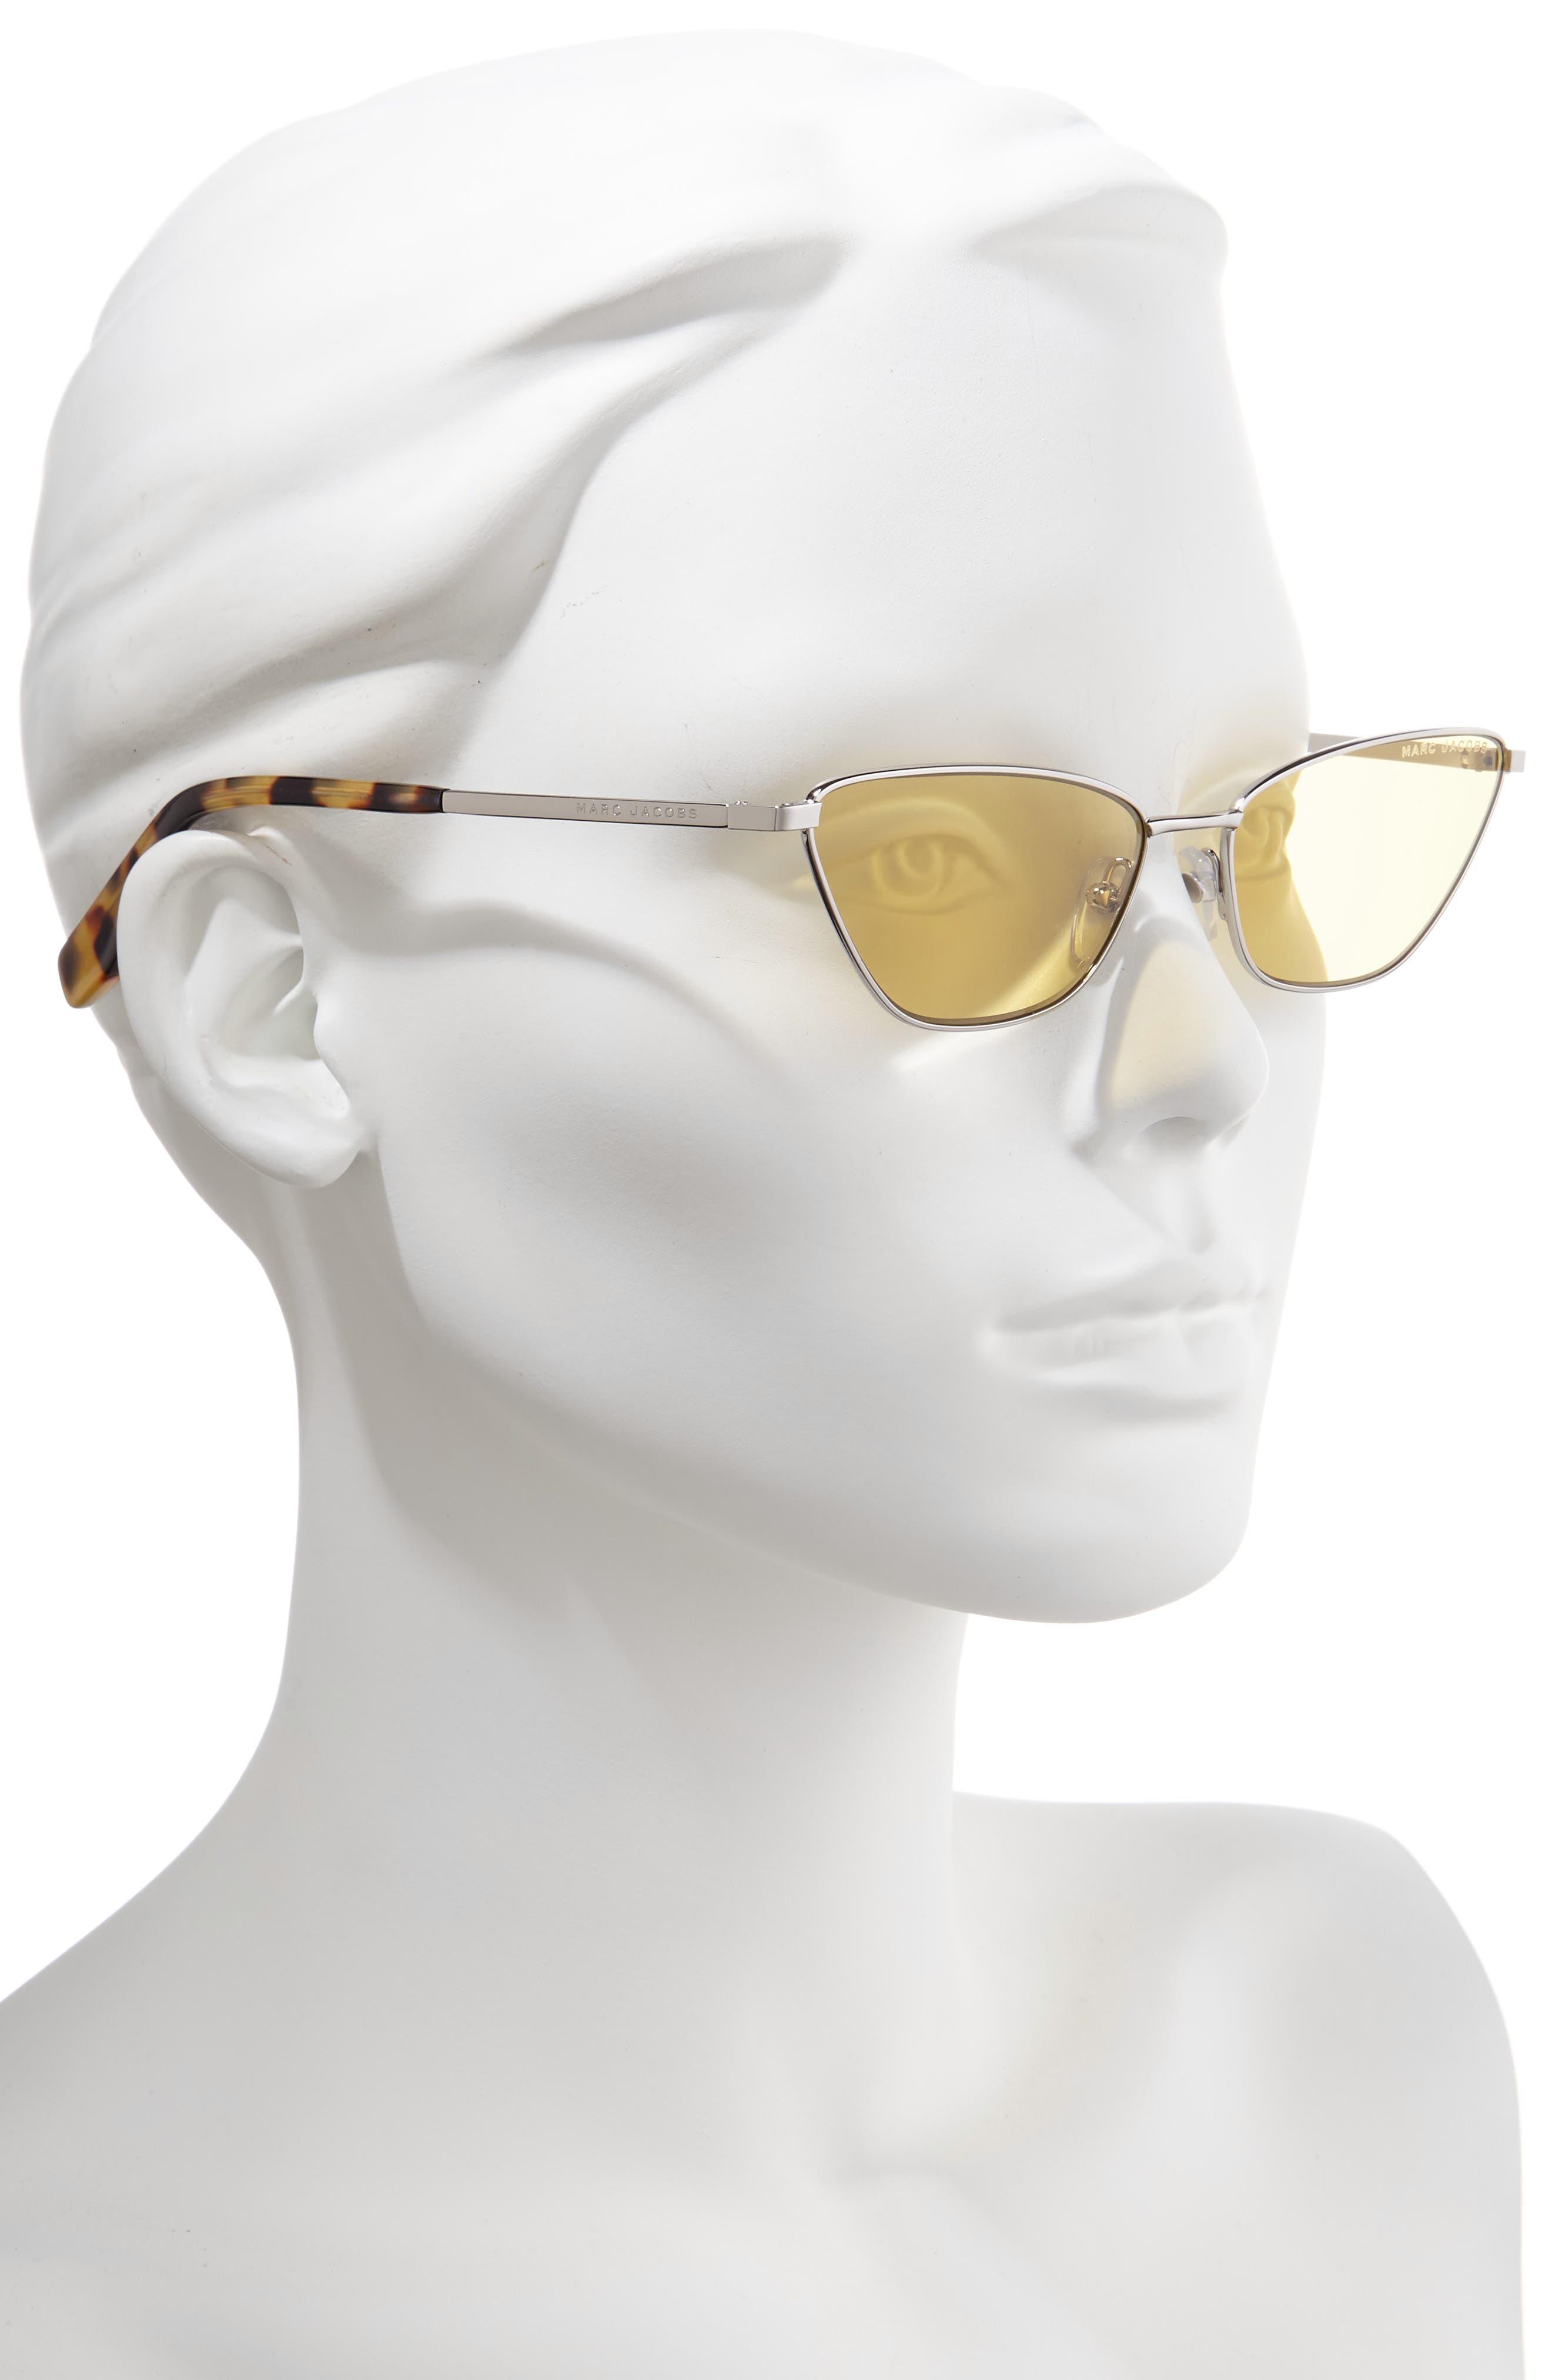 57mm Cat Eye Sunglasses,                             Alternate thumbnail 2, color,                             SILVER/ YELLOW